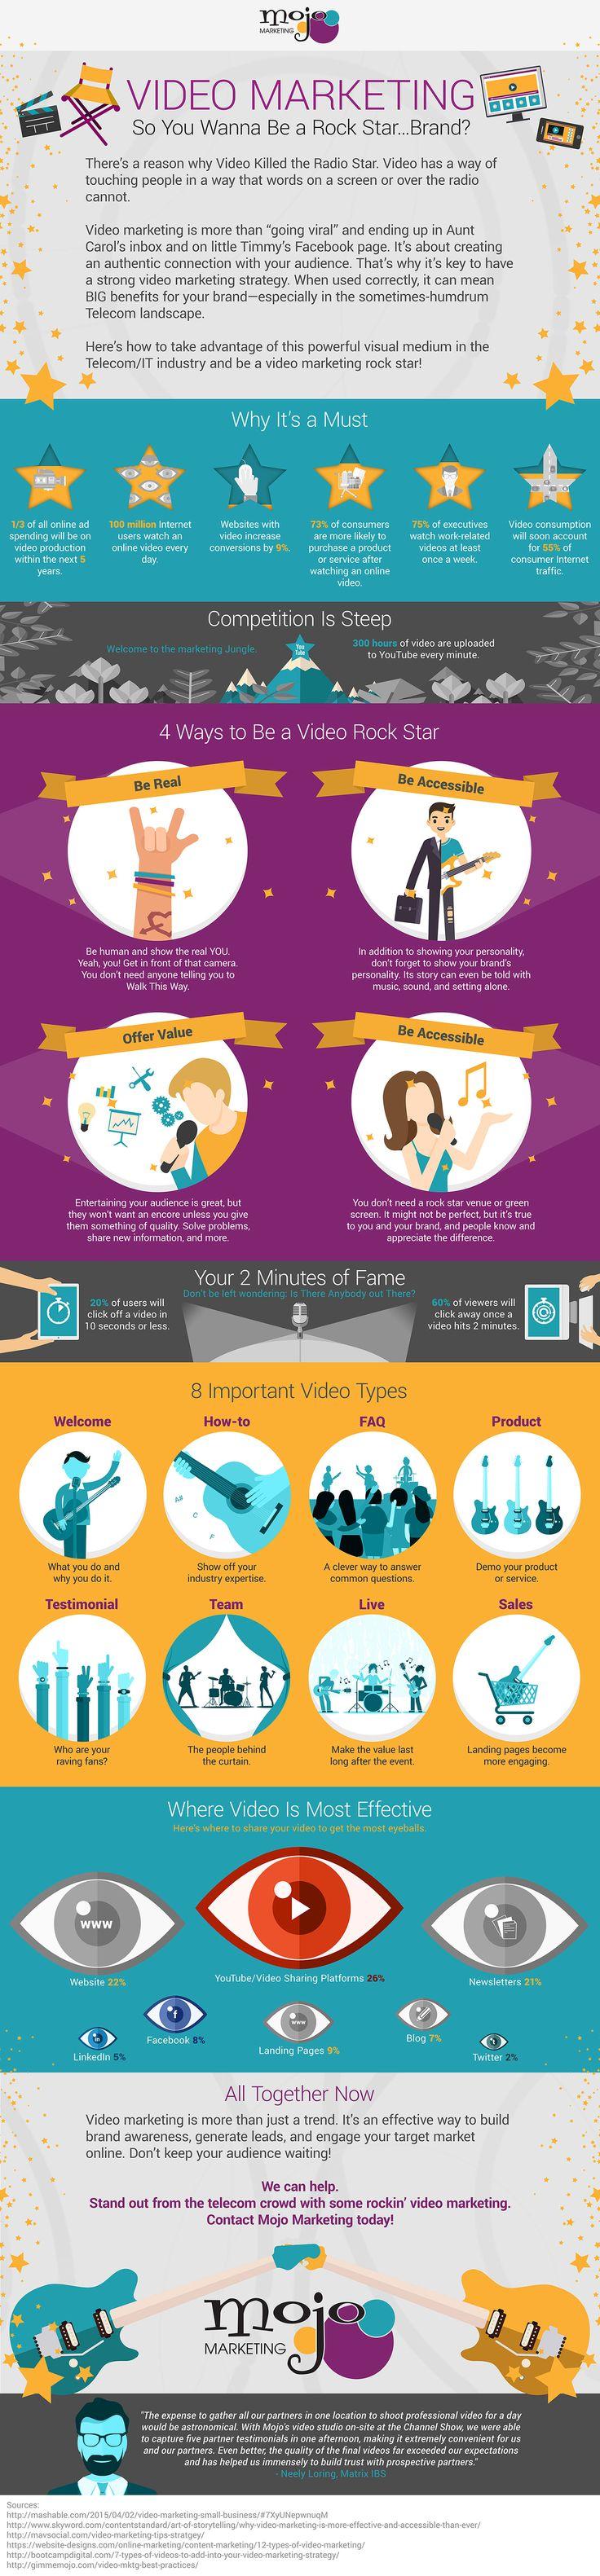 Video Marketing: So You Wanna Be a Rock Star… Brand? #infographic #Marketing #VideoMarketing